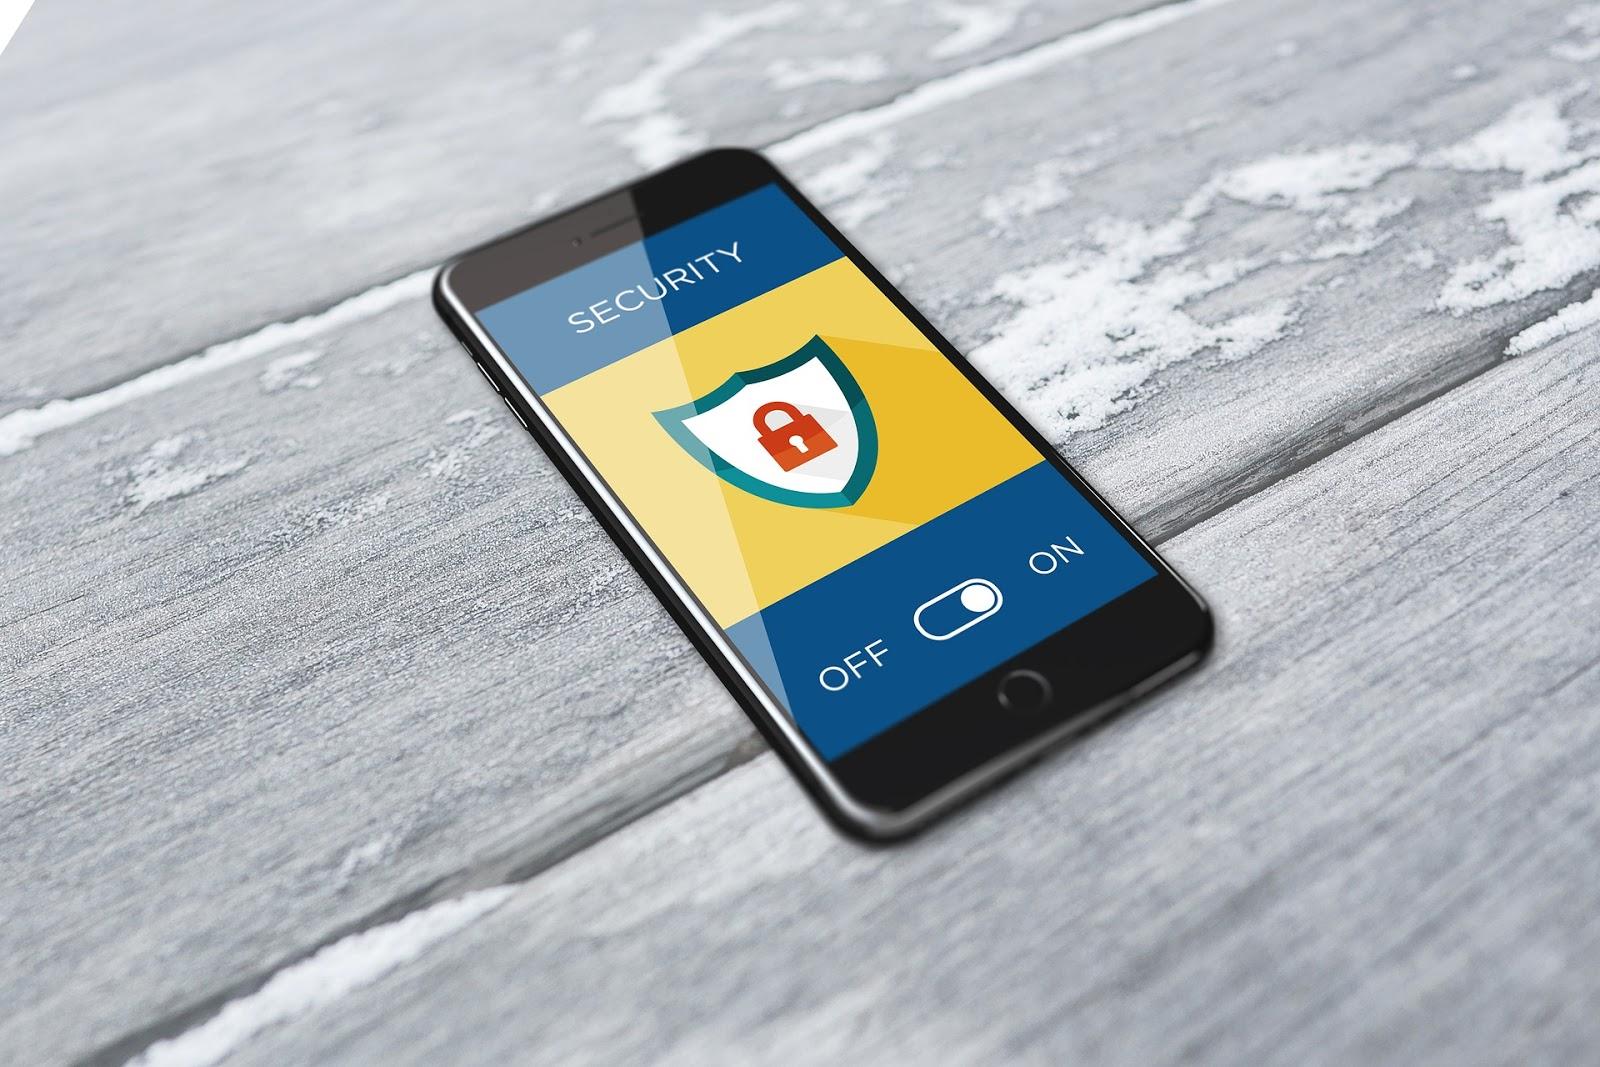 Php web development, Top 7 Custom PHP Web Development Techniques to Minimize Security Vulnerabilities